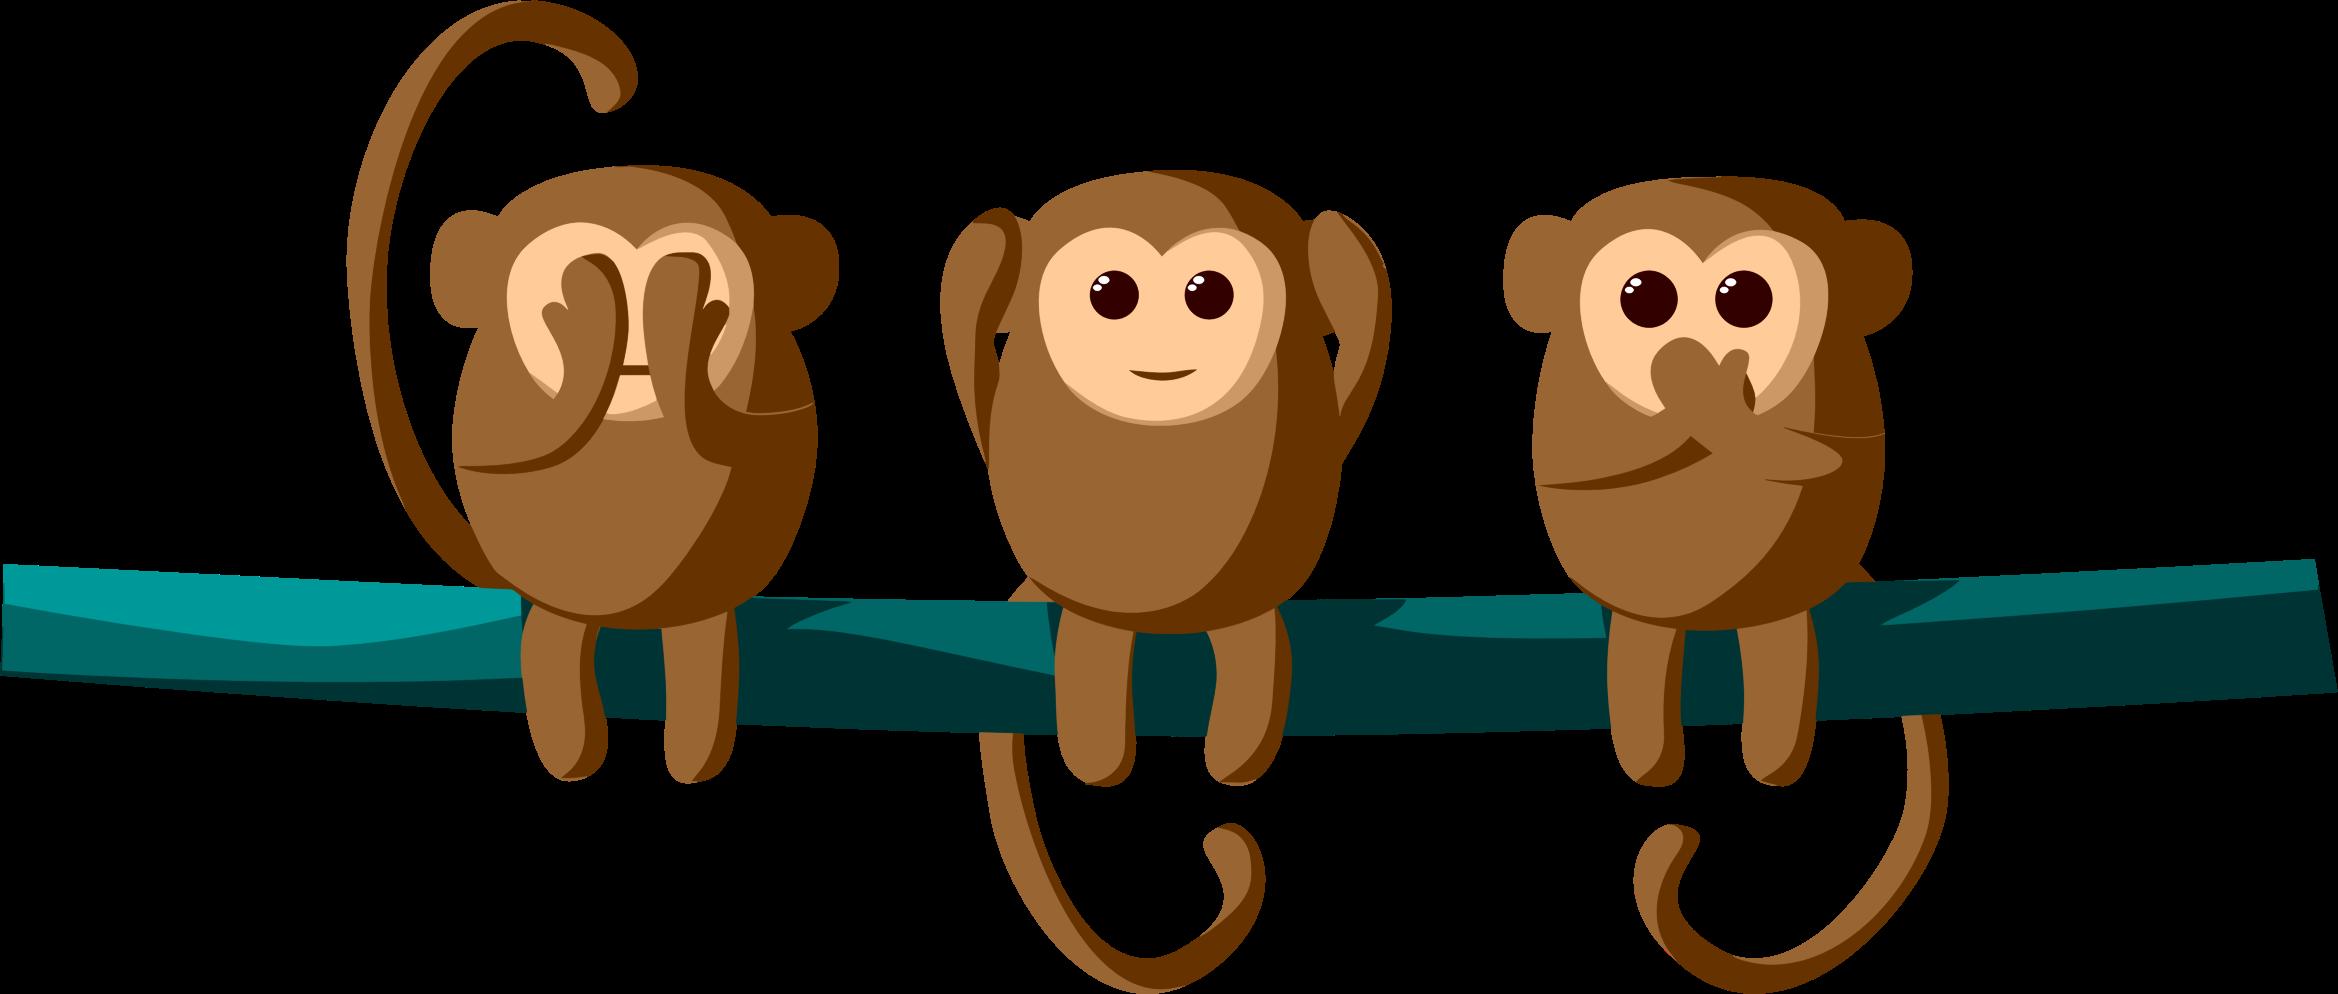 Hear speak monkeys big. See clipart animated